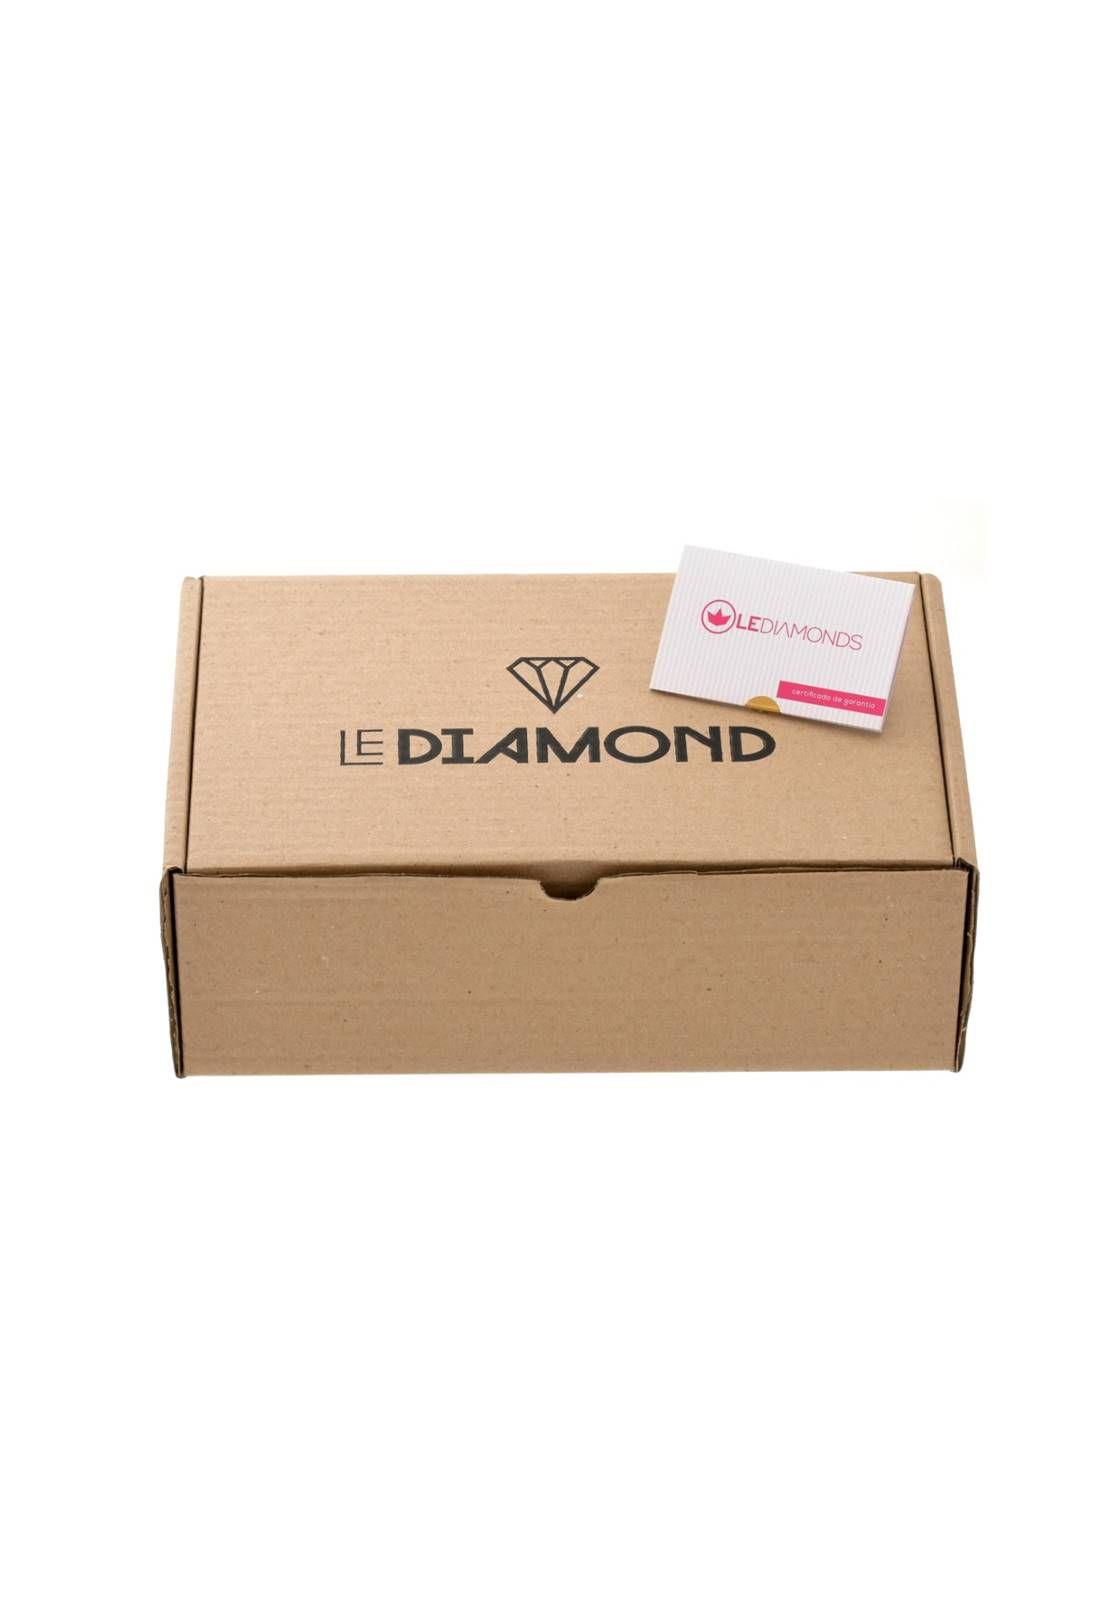 Brinco Argola Le Diamond Quadrada Metalizada